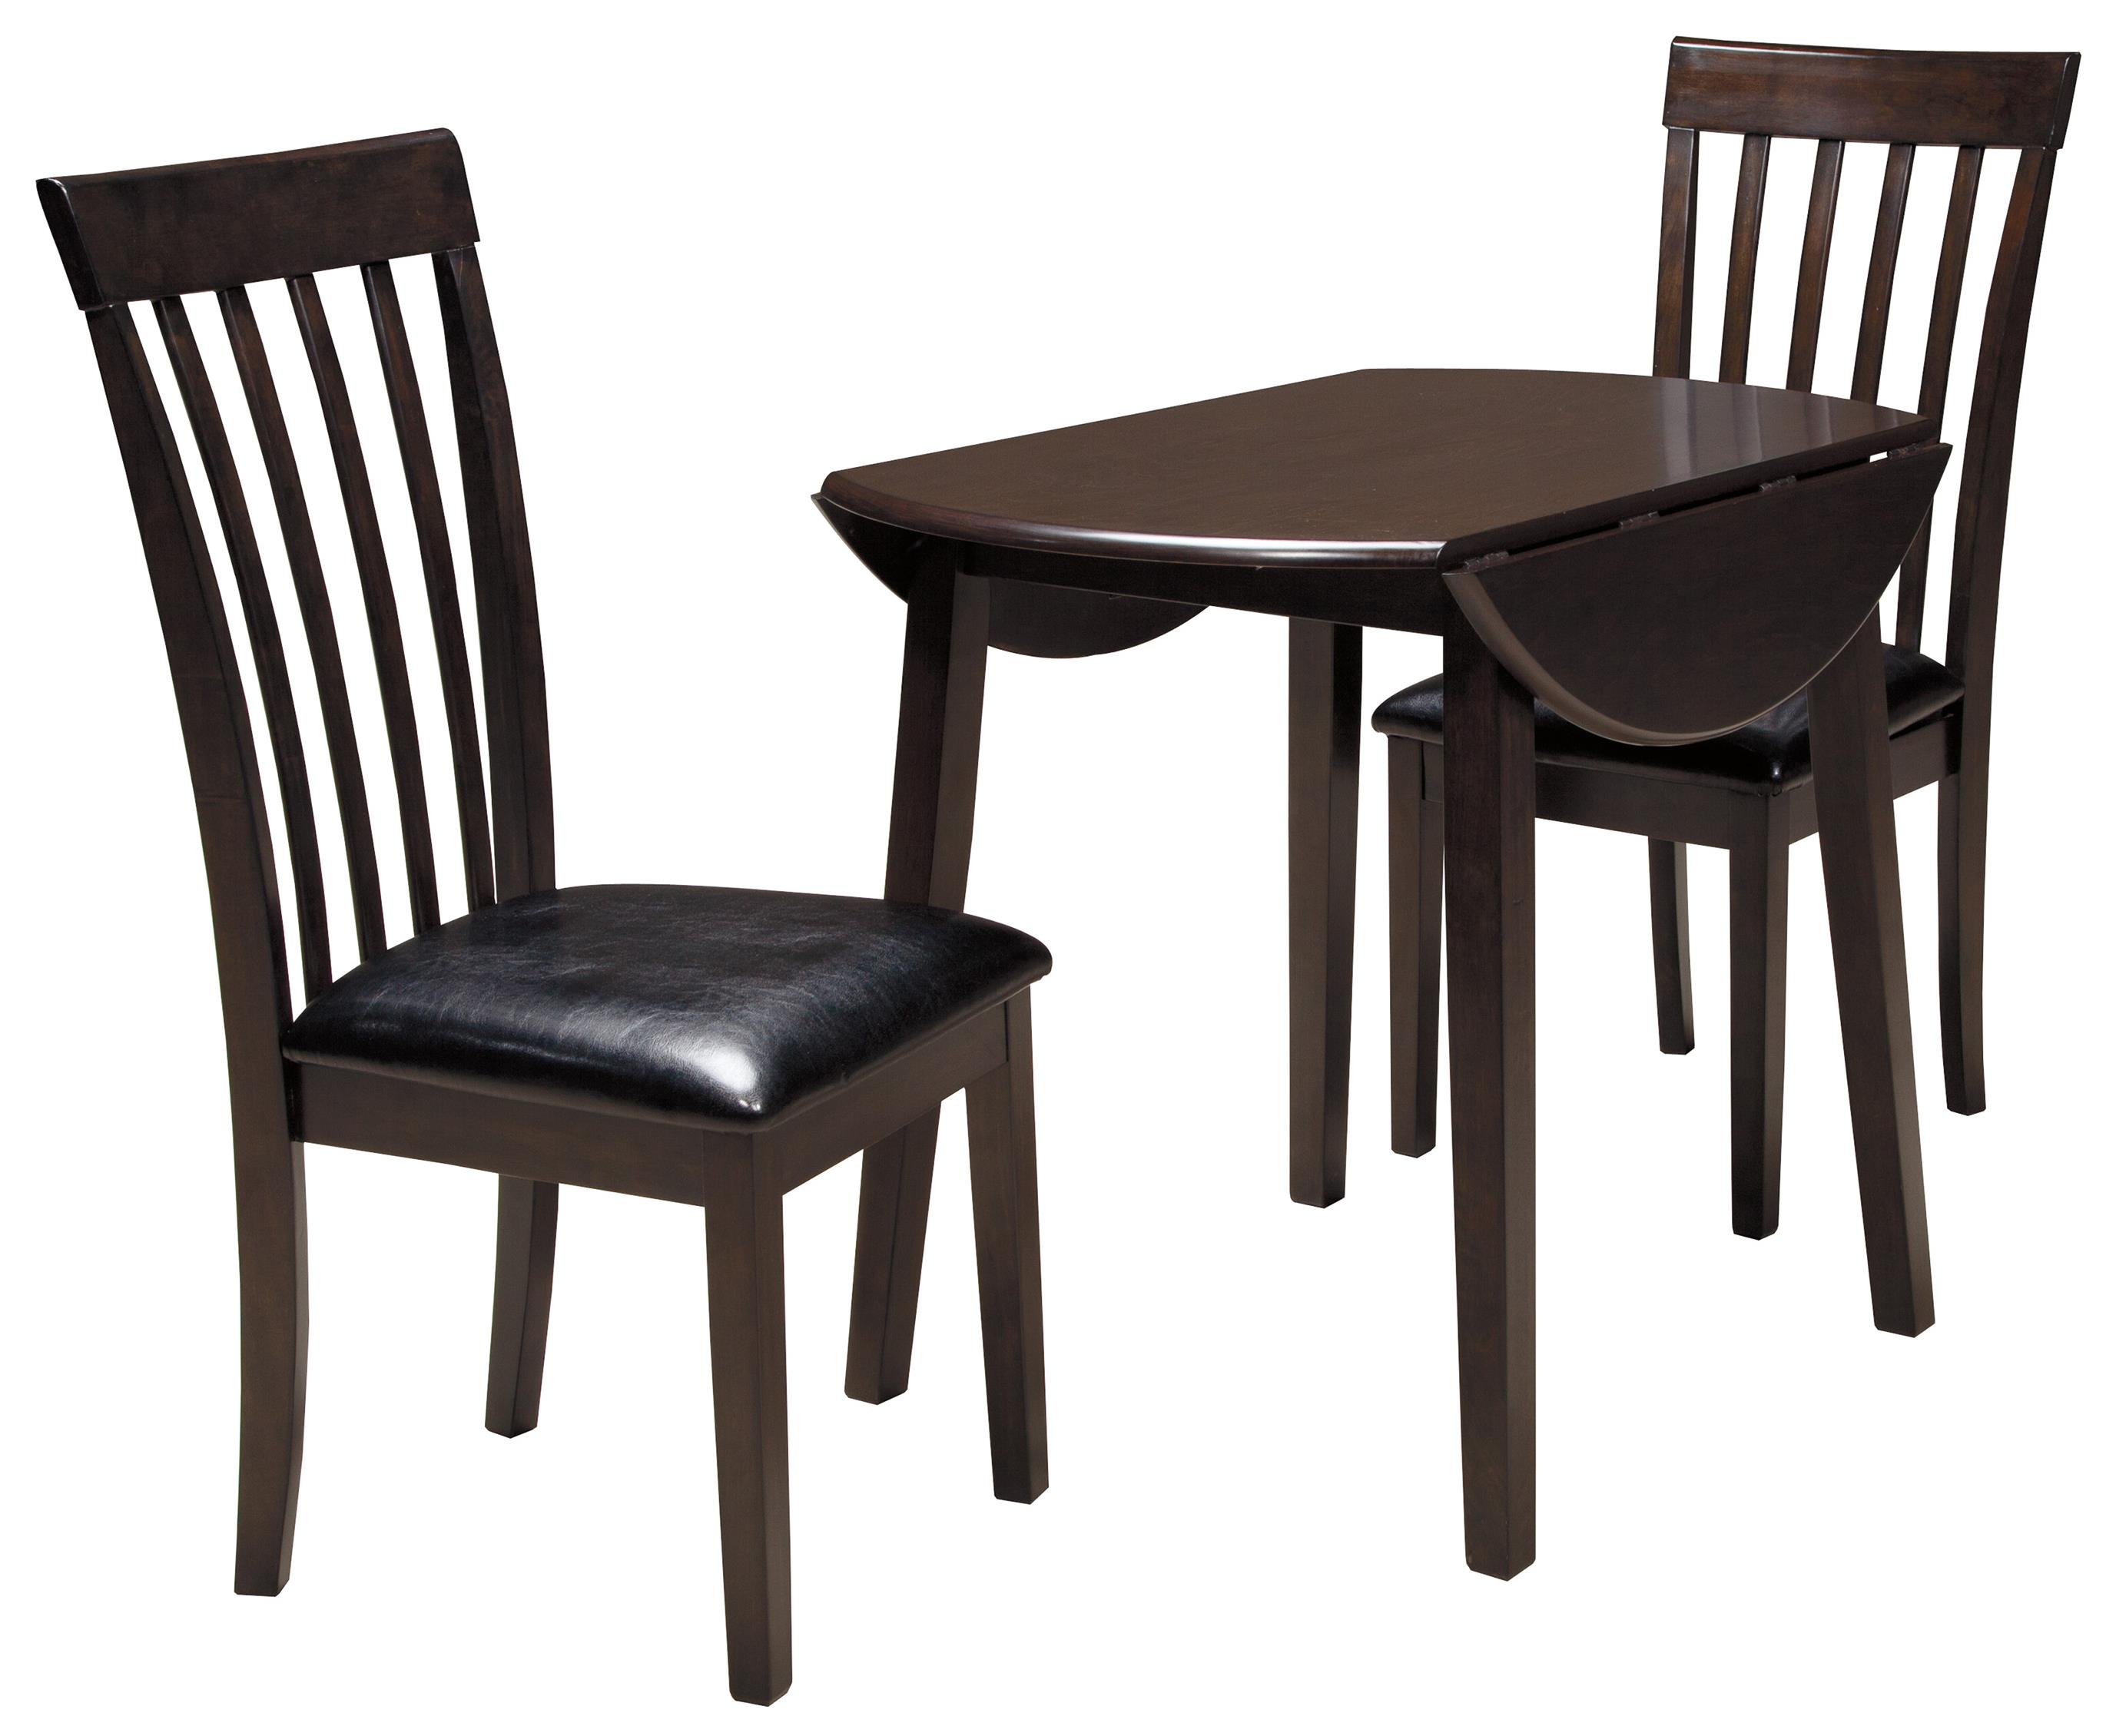 3-Piece Round Drop Leaf Table Set  sc 1 st  Wolf Furniture & 3-Piece Round Drop Leaf Table Set by Signature Design by Ashley ...